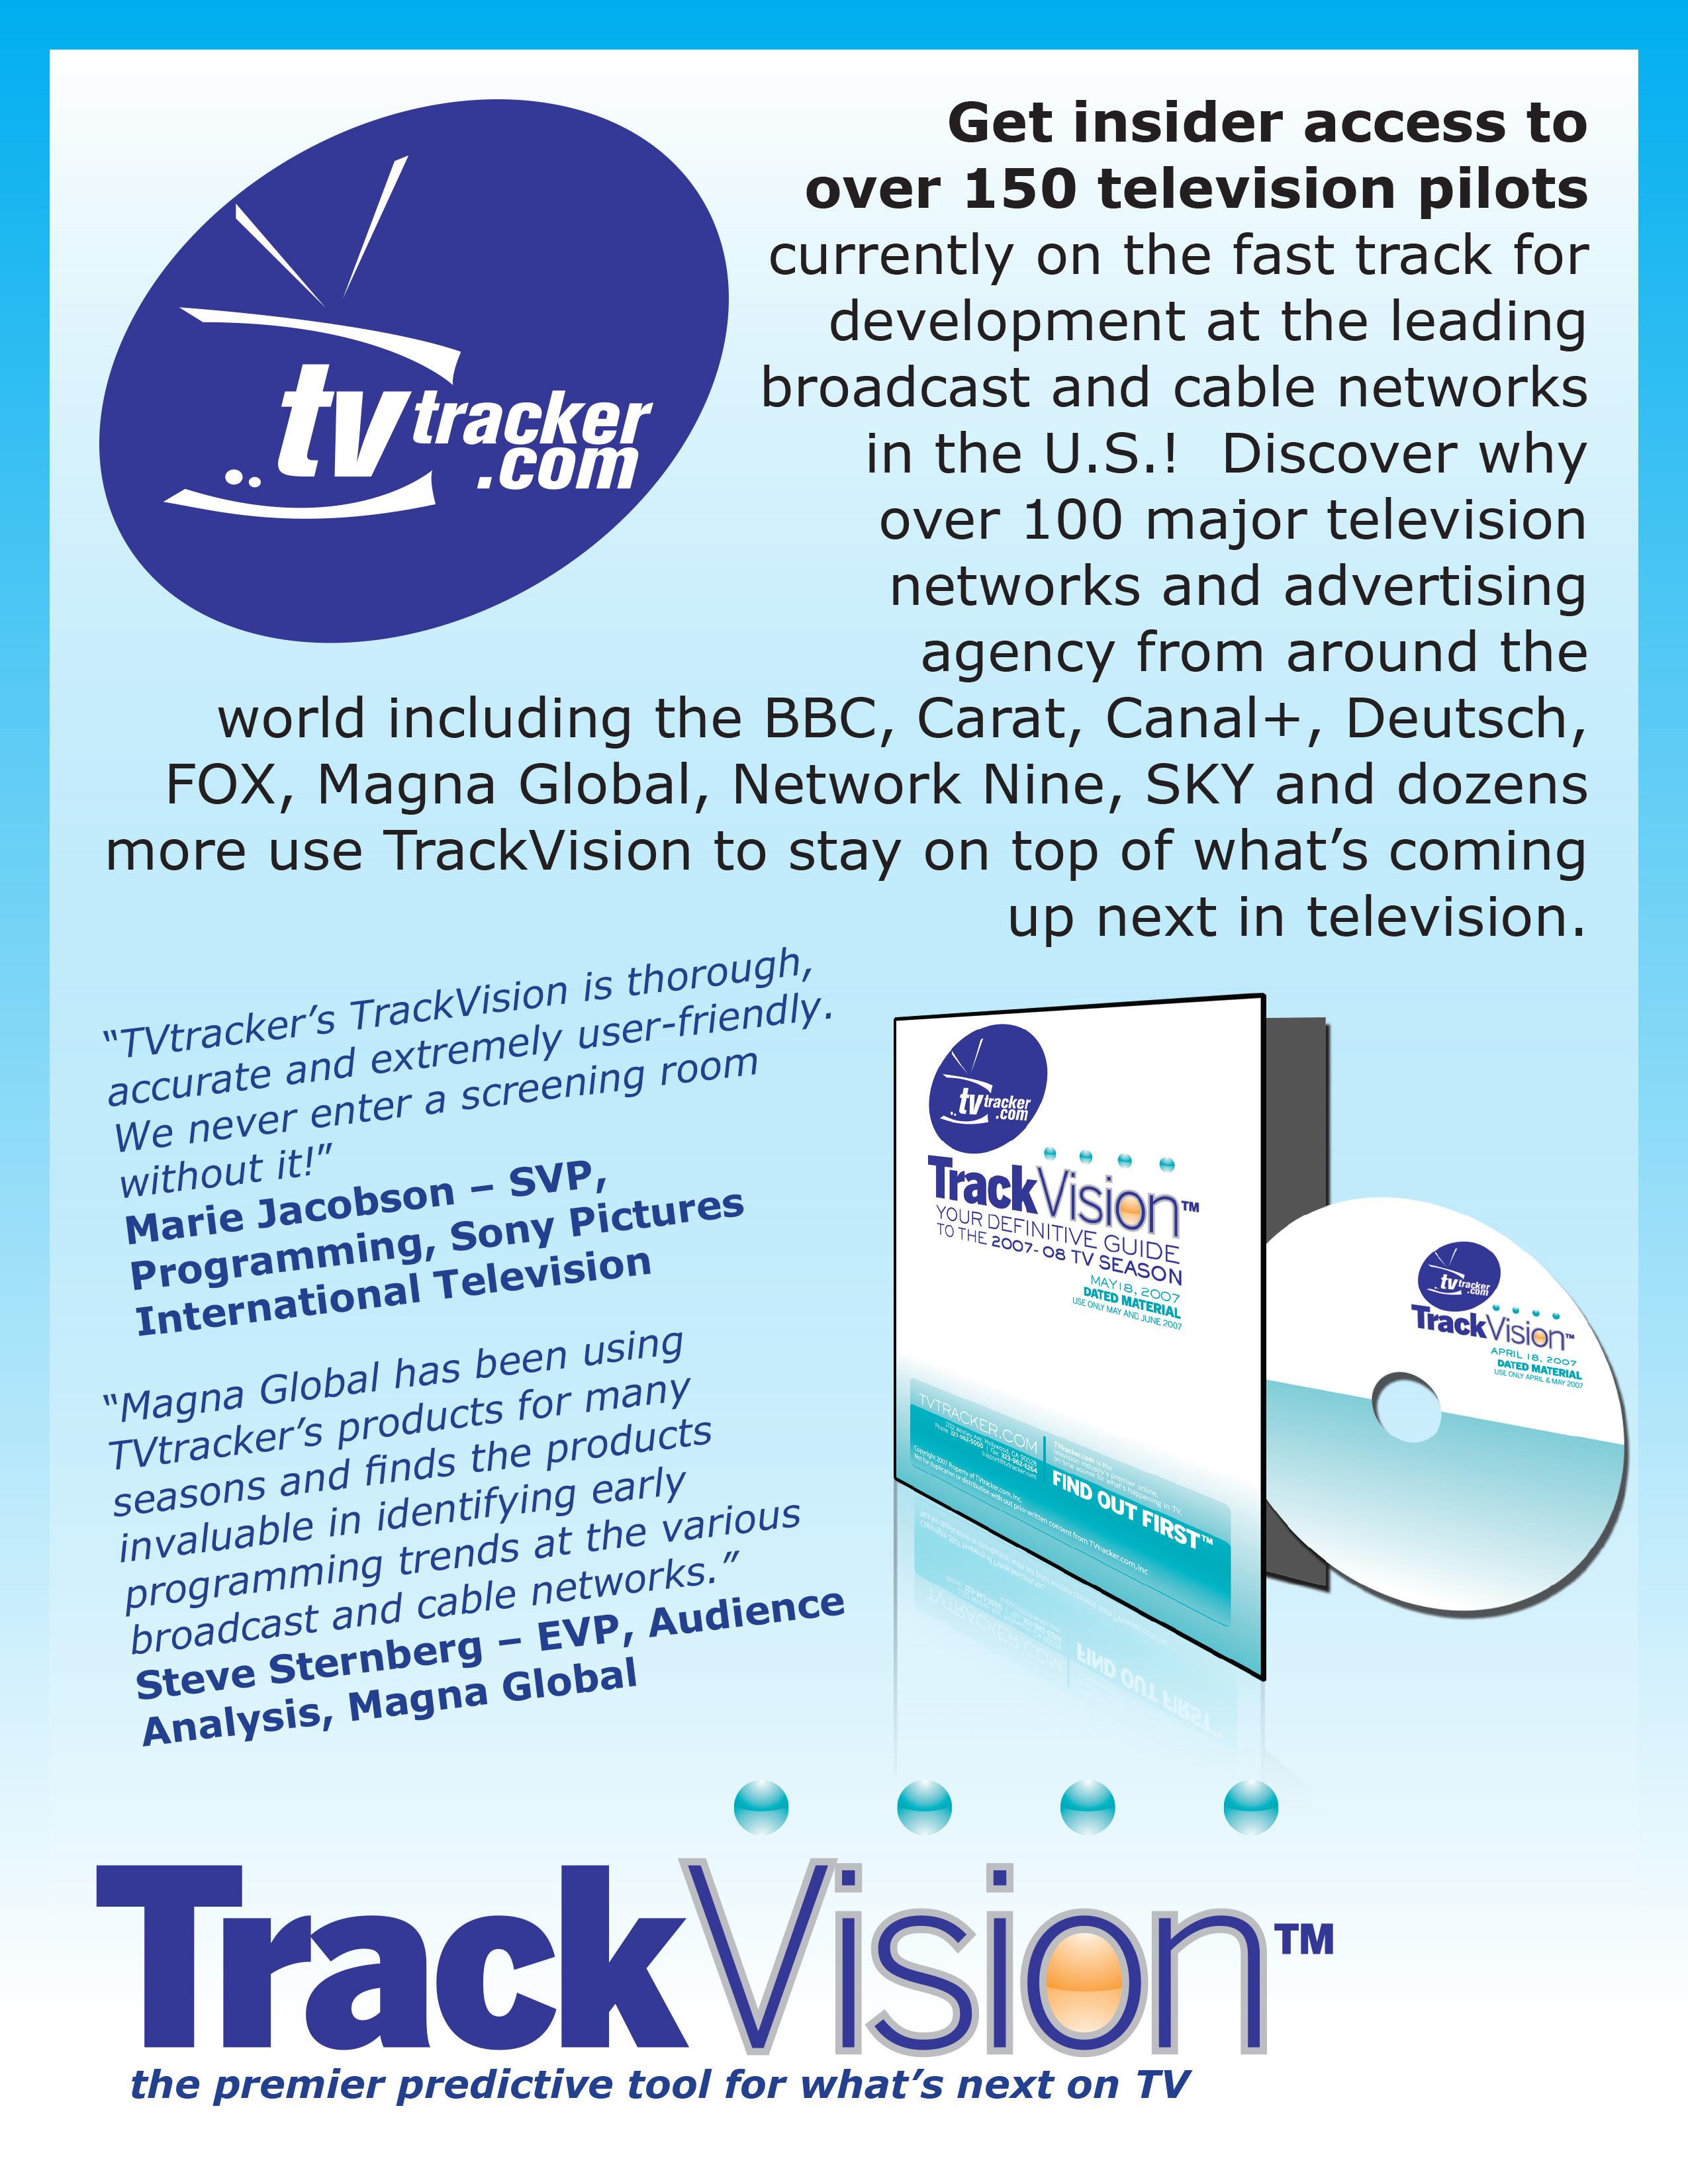 TVTracker.com